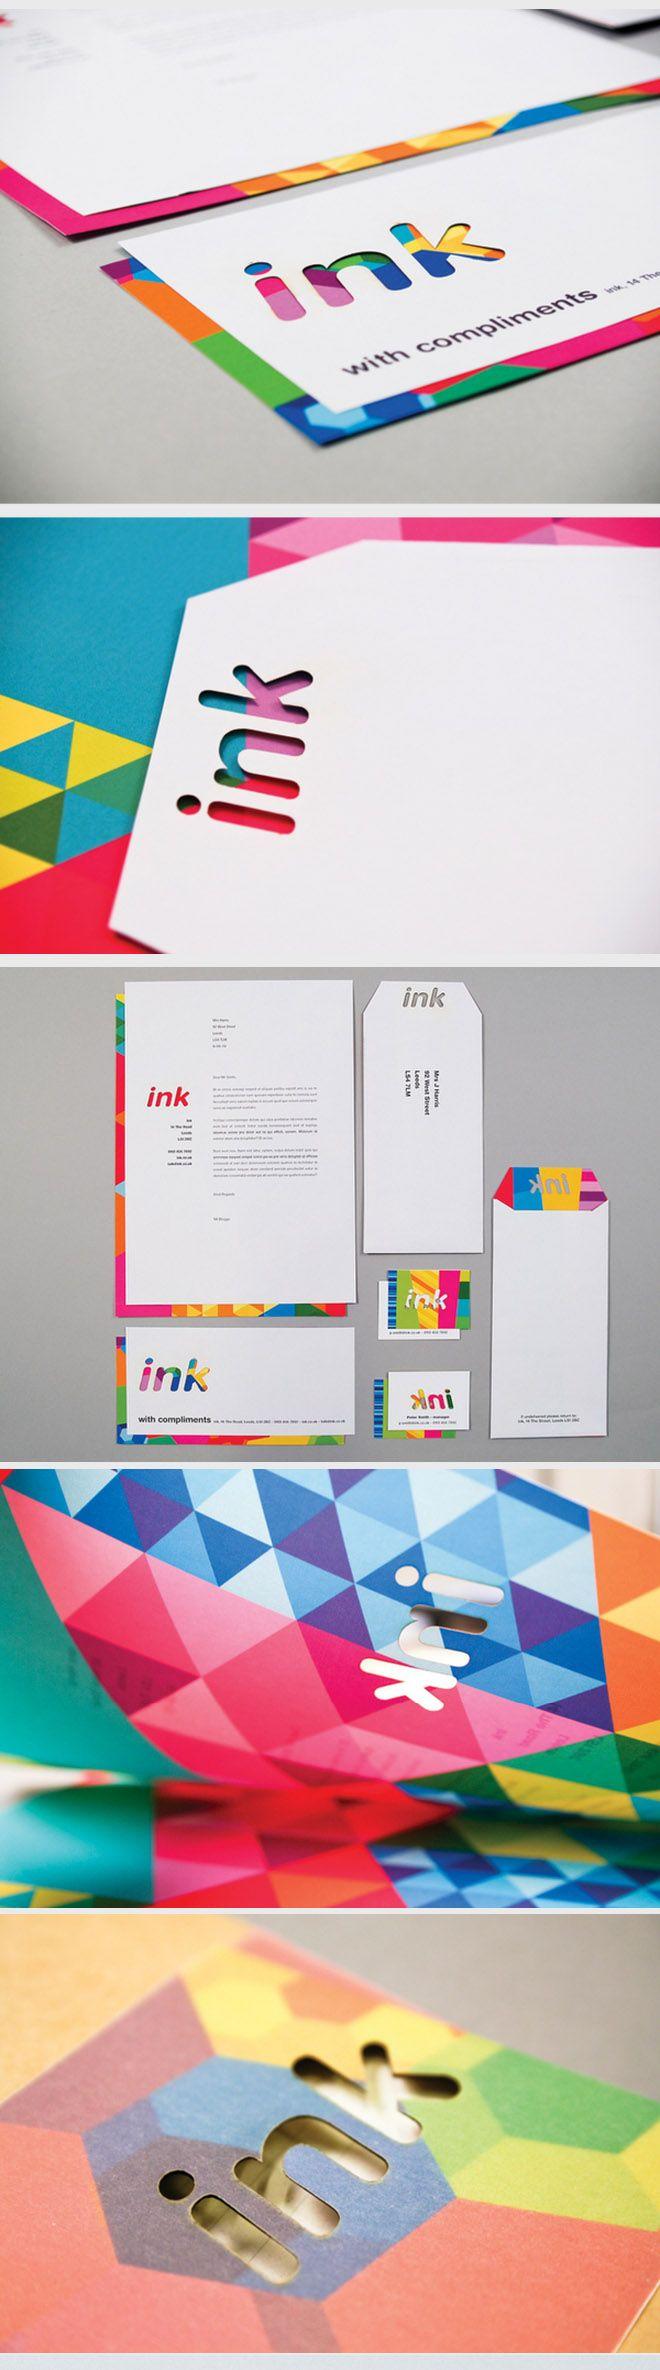 Creative and Beautiful Branding Identity Design